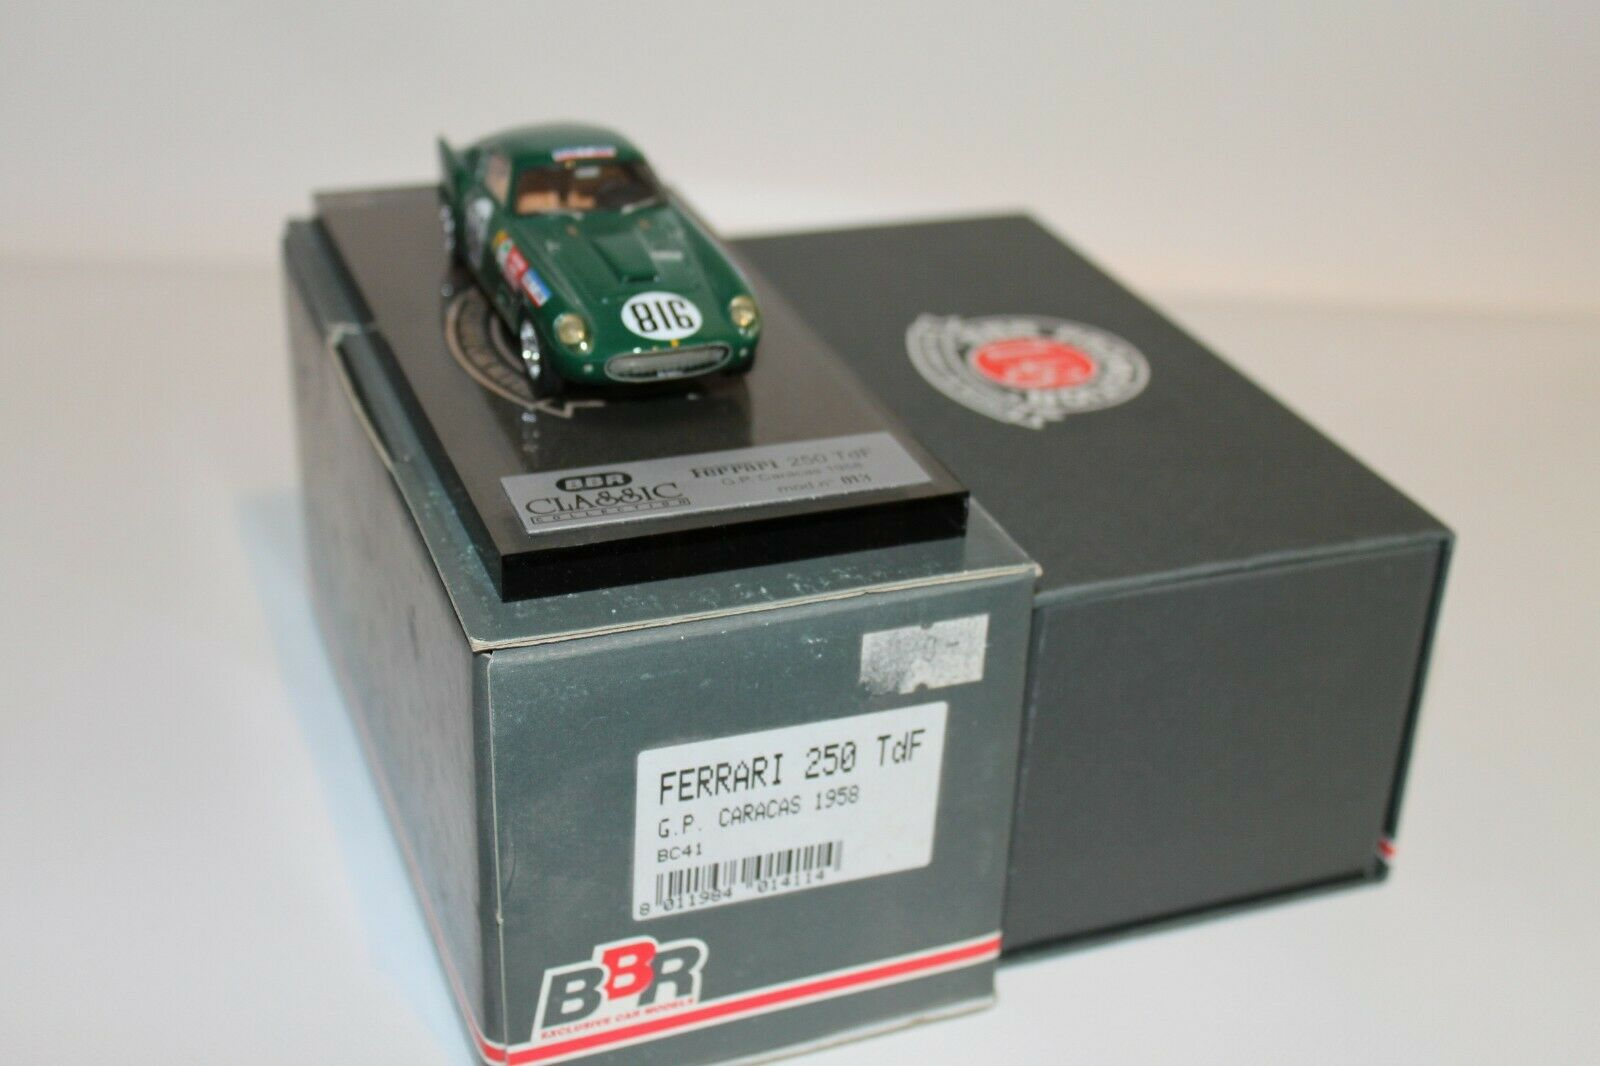 promociones de equipo BBR BC41 BC41 BC41 Ferrari 250 TDF G.P. Cocheacas 1958  Ven a elegir tu propio estilo deportivo.